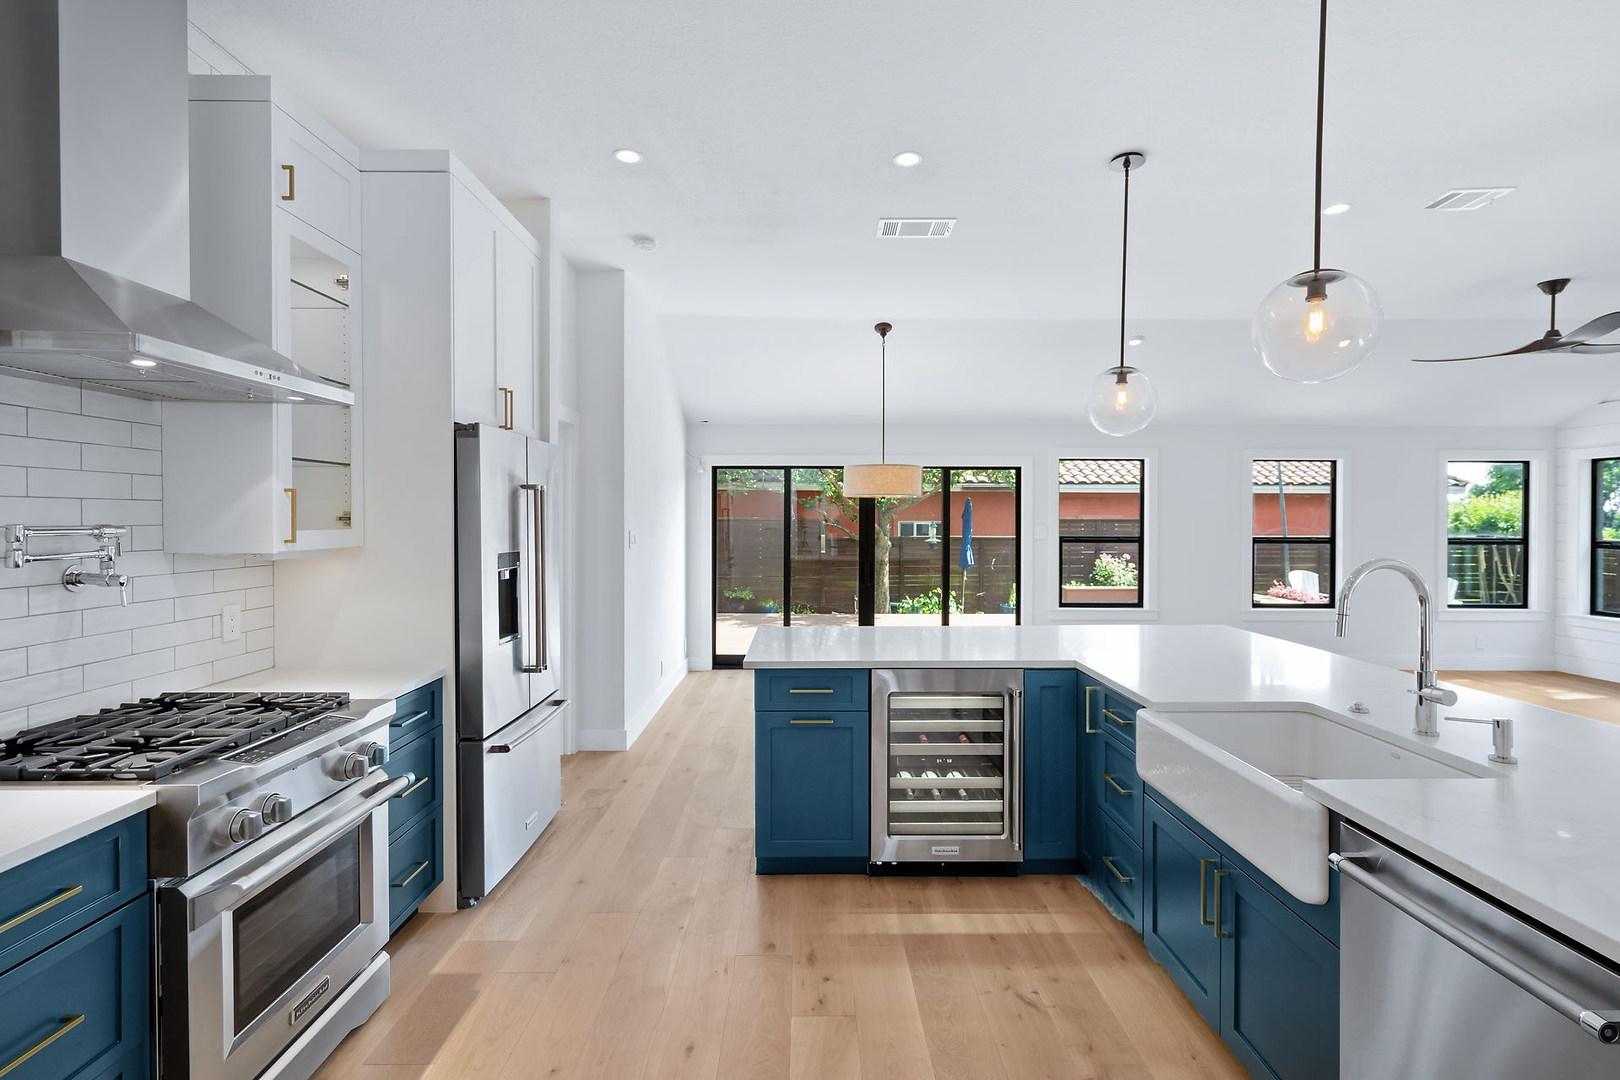 Home Renovation Kitchen on Lost Horizon in Austin, TX